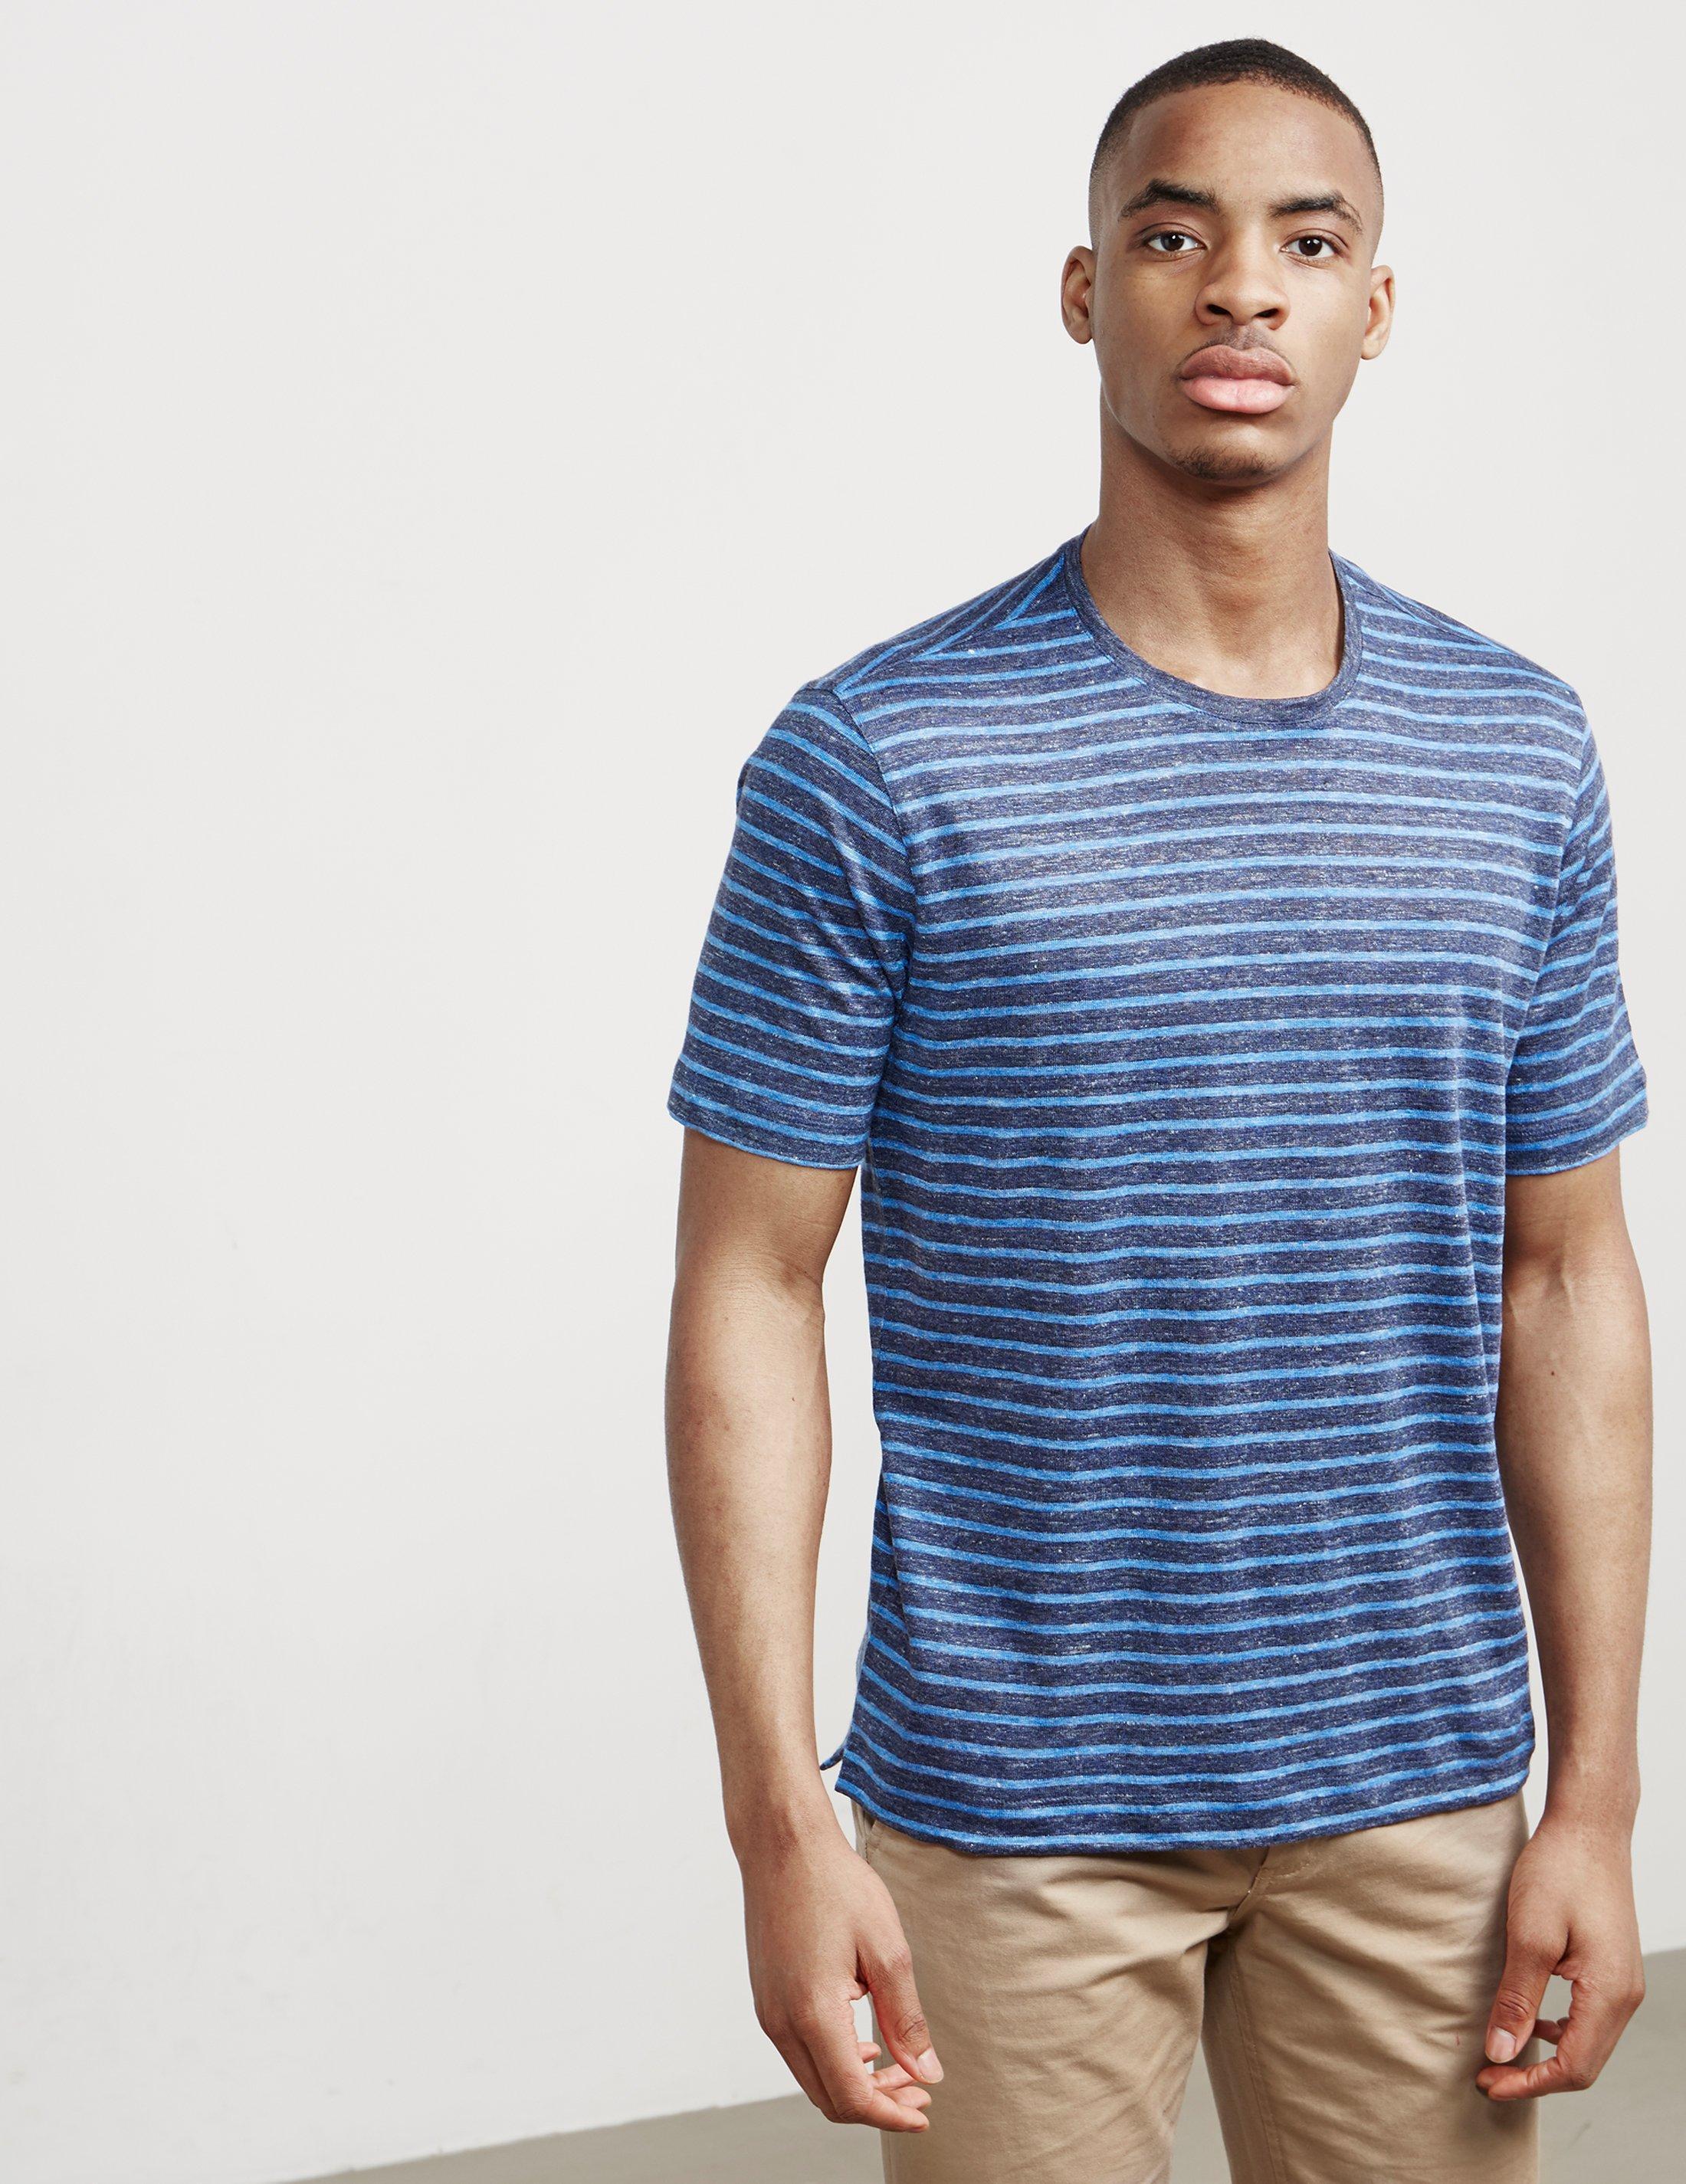 Clearance Cheap Marketable short-sleeve T-shirt - Blue Ermenegildo Zegna Clearance Official Free Shipping Nicekicks v6JJG8tDHj